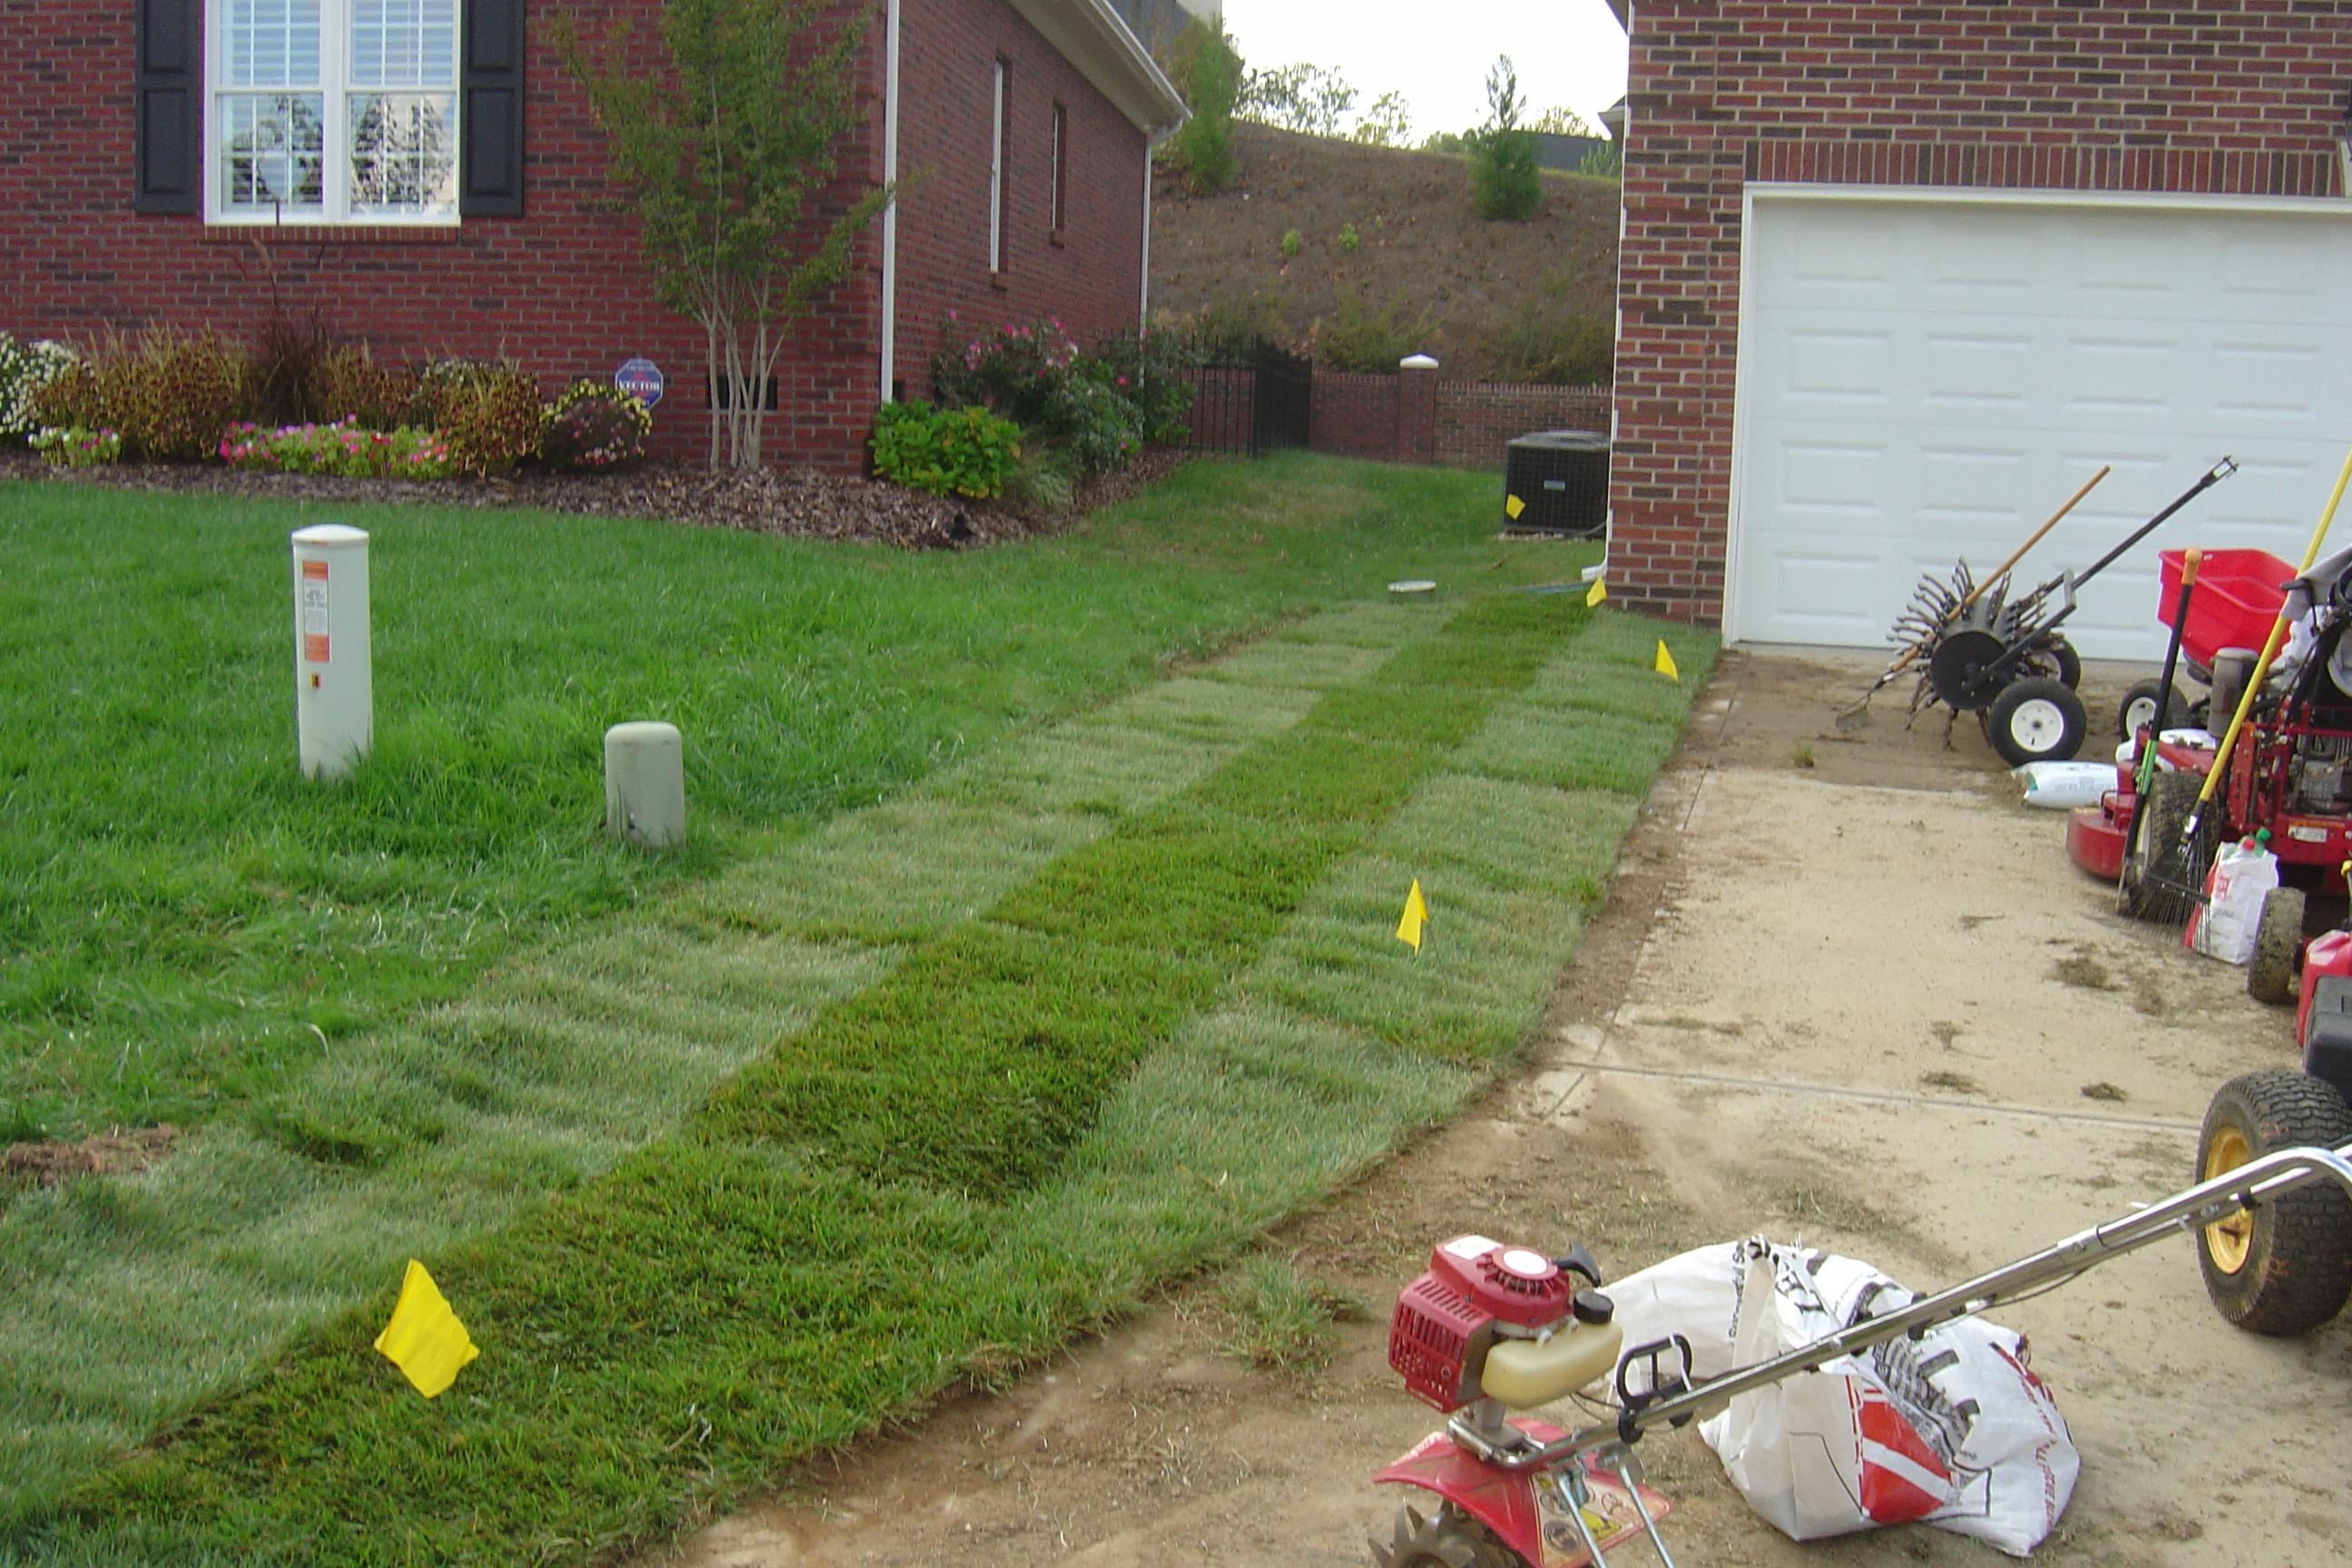 nc interior landscaping charlotte nc impact landscaping charlotte nc 2592x1728